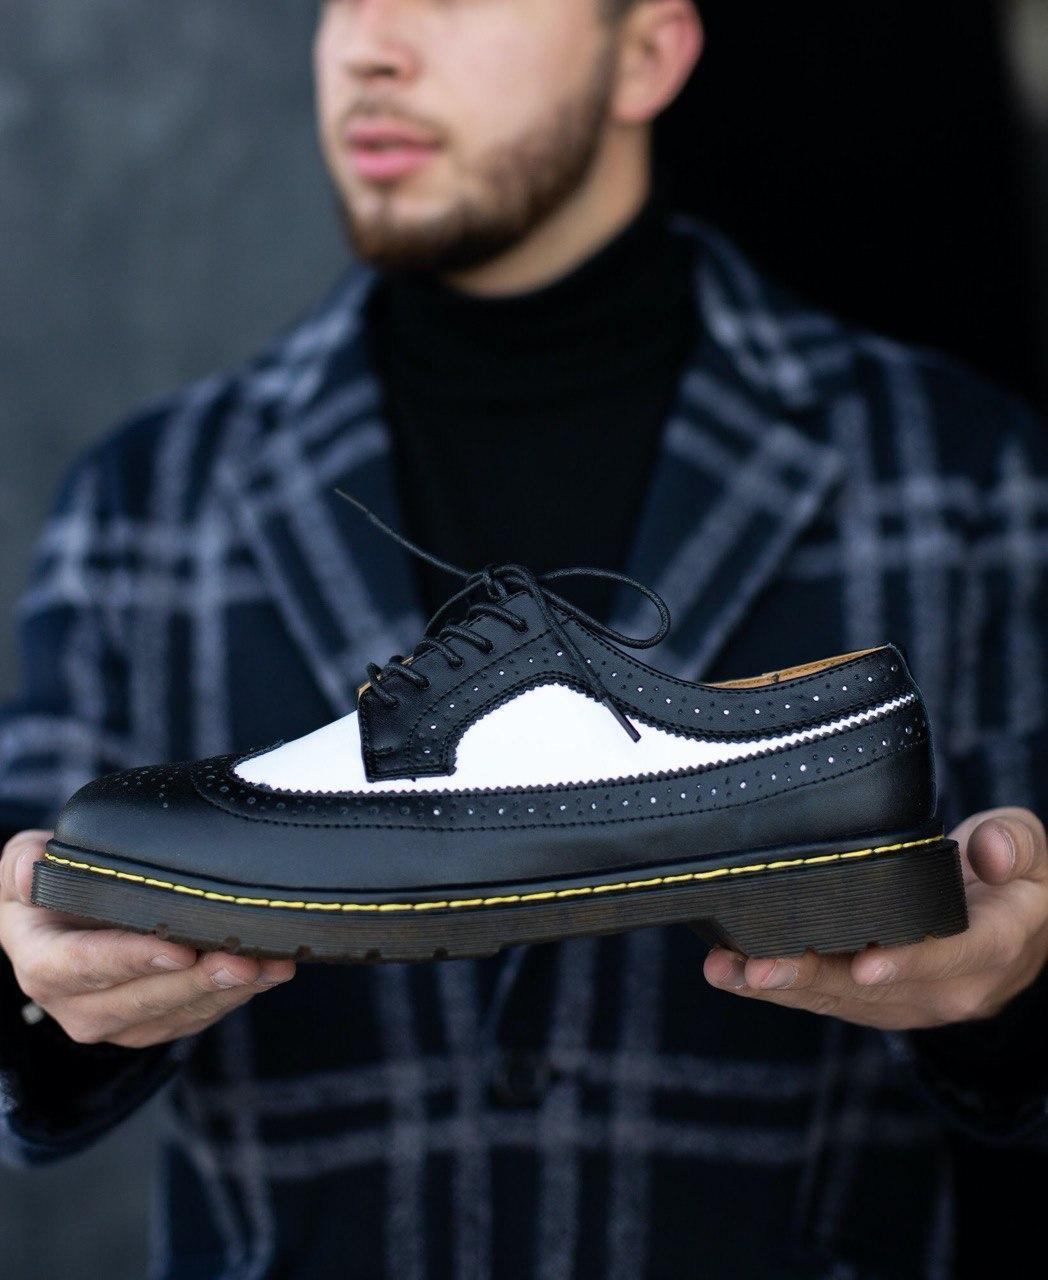 Мужские осенние туфли Dr. Martens low (full black), мужские туфли Доктор Мартенс (Реплика ААА)